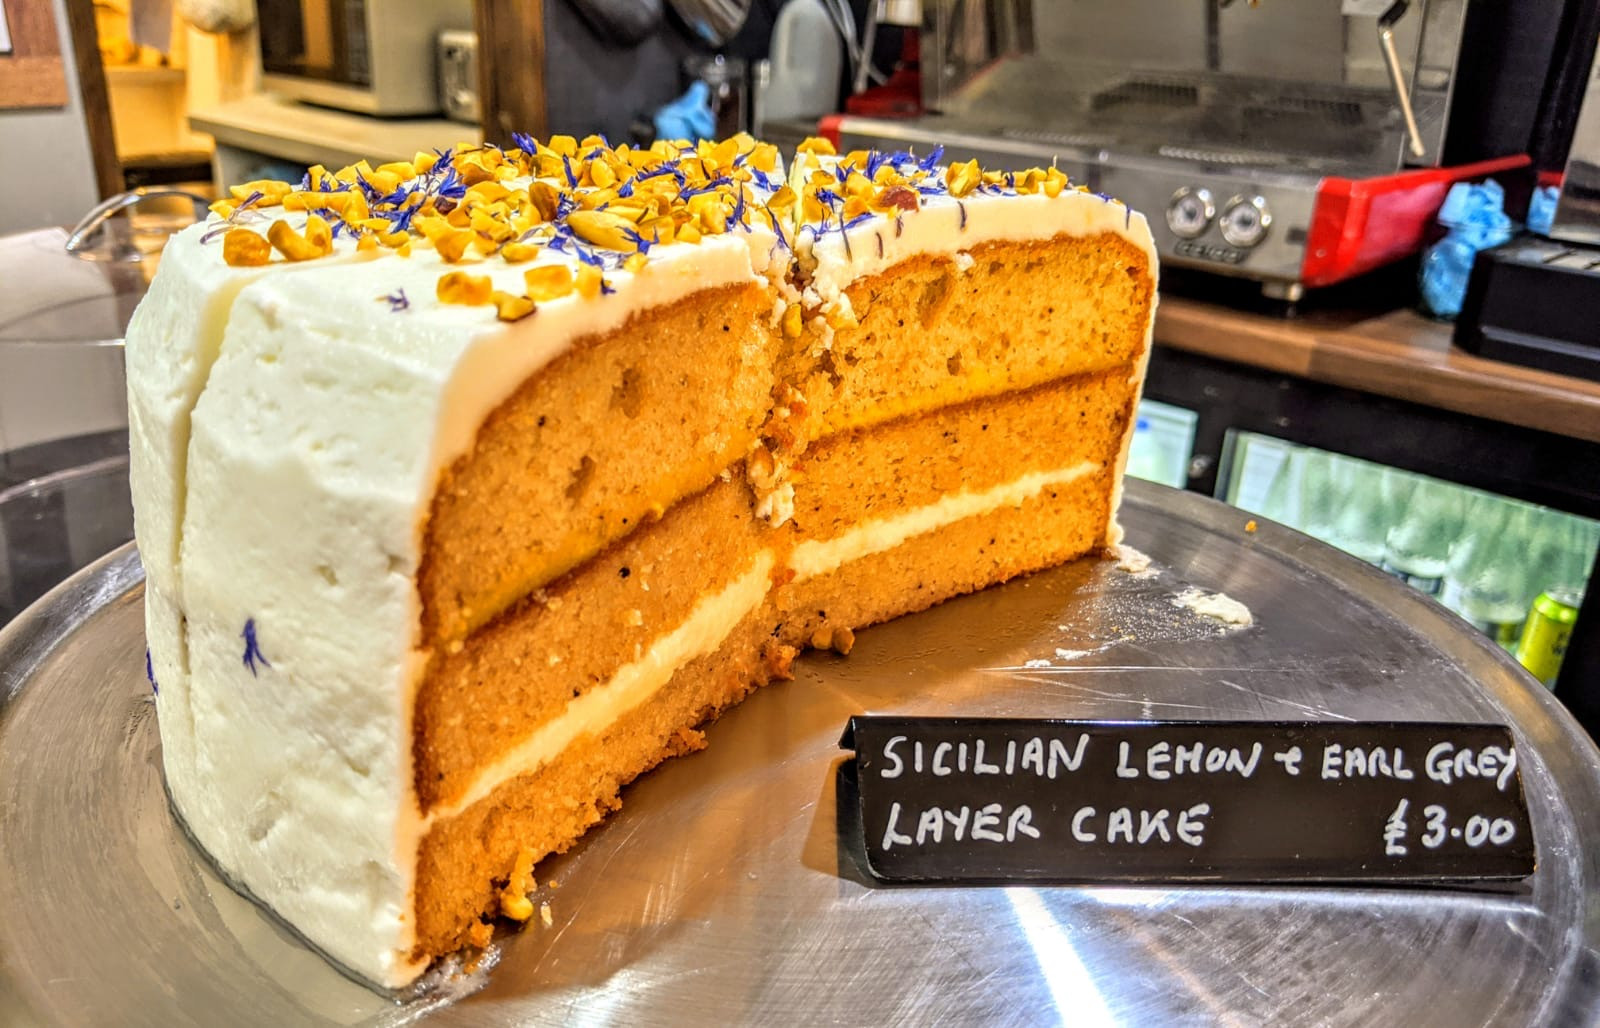 Lemon and Earl Grey Cake